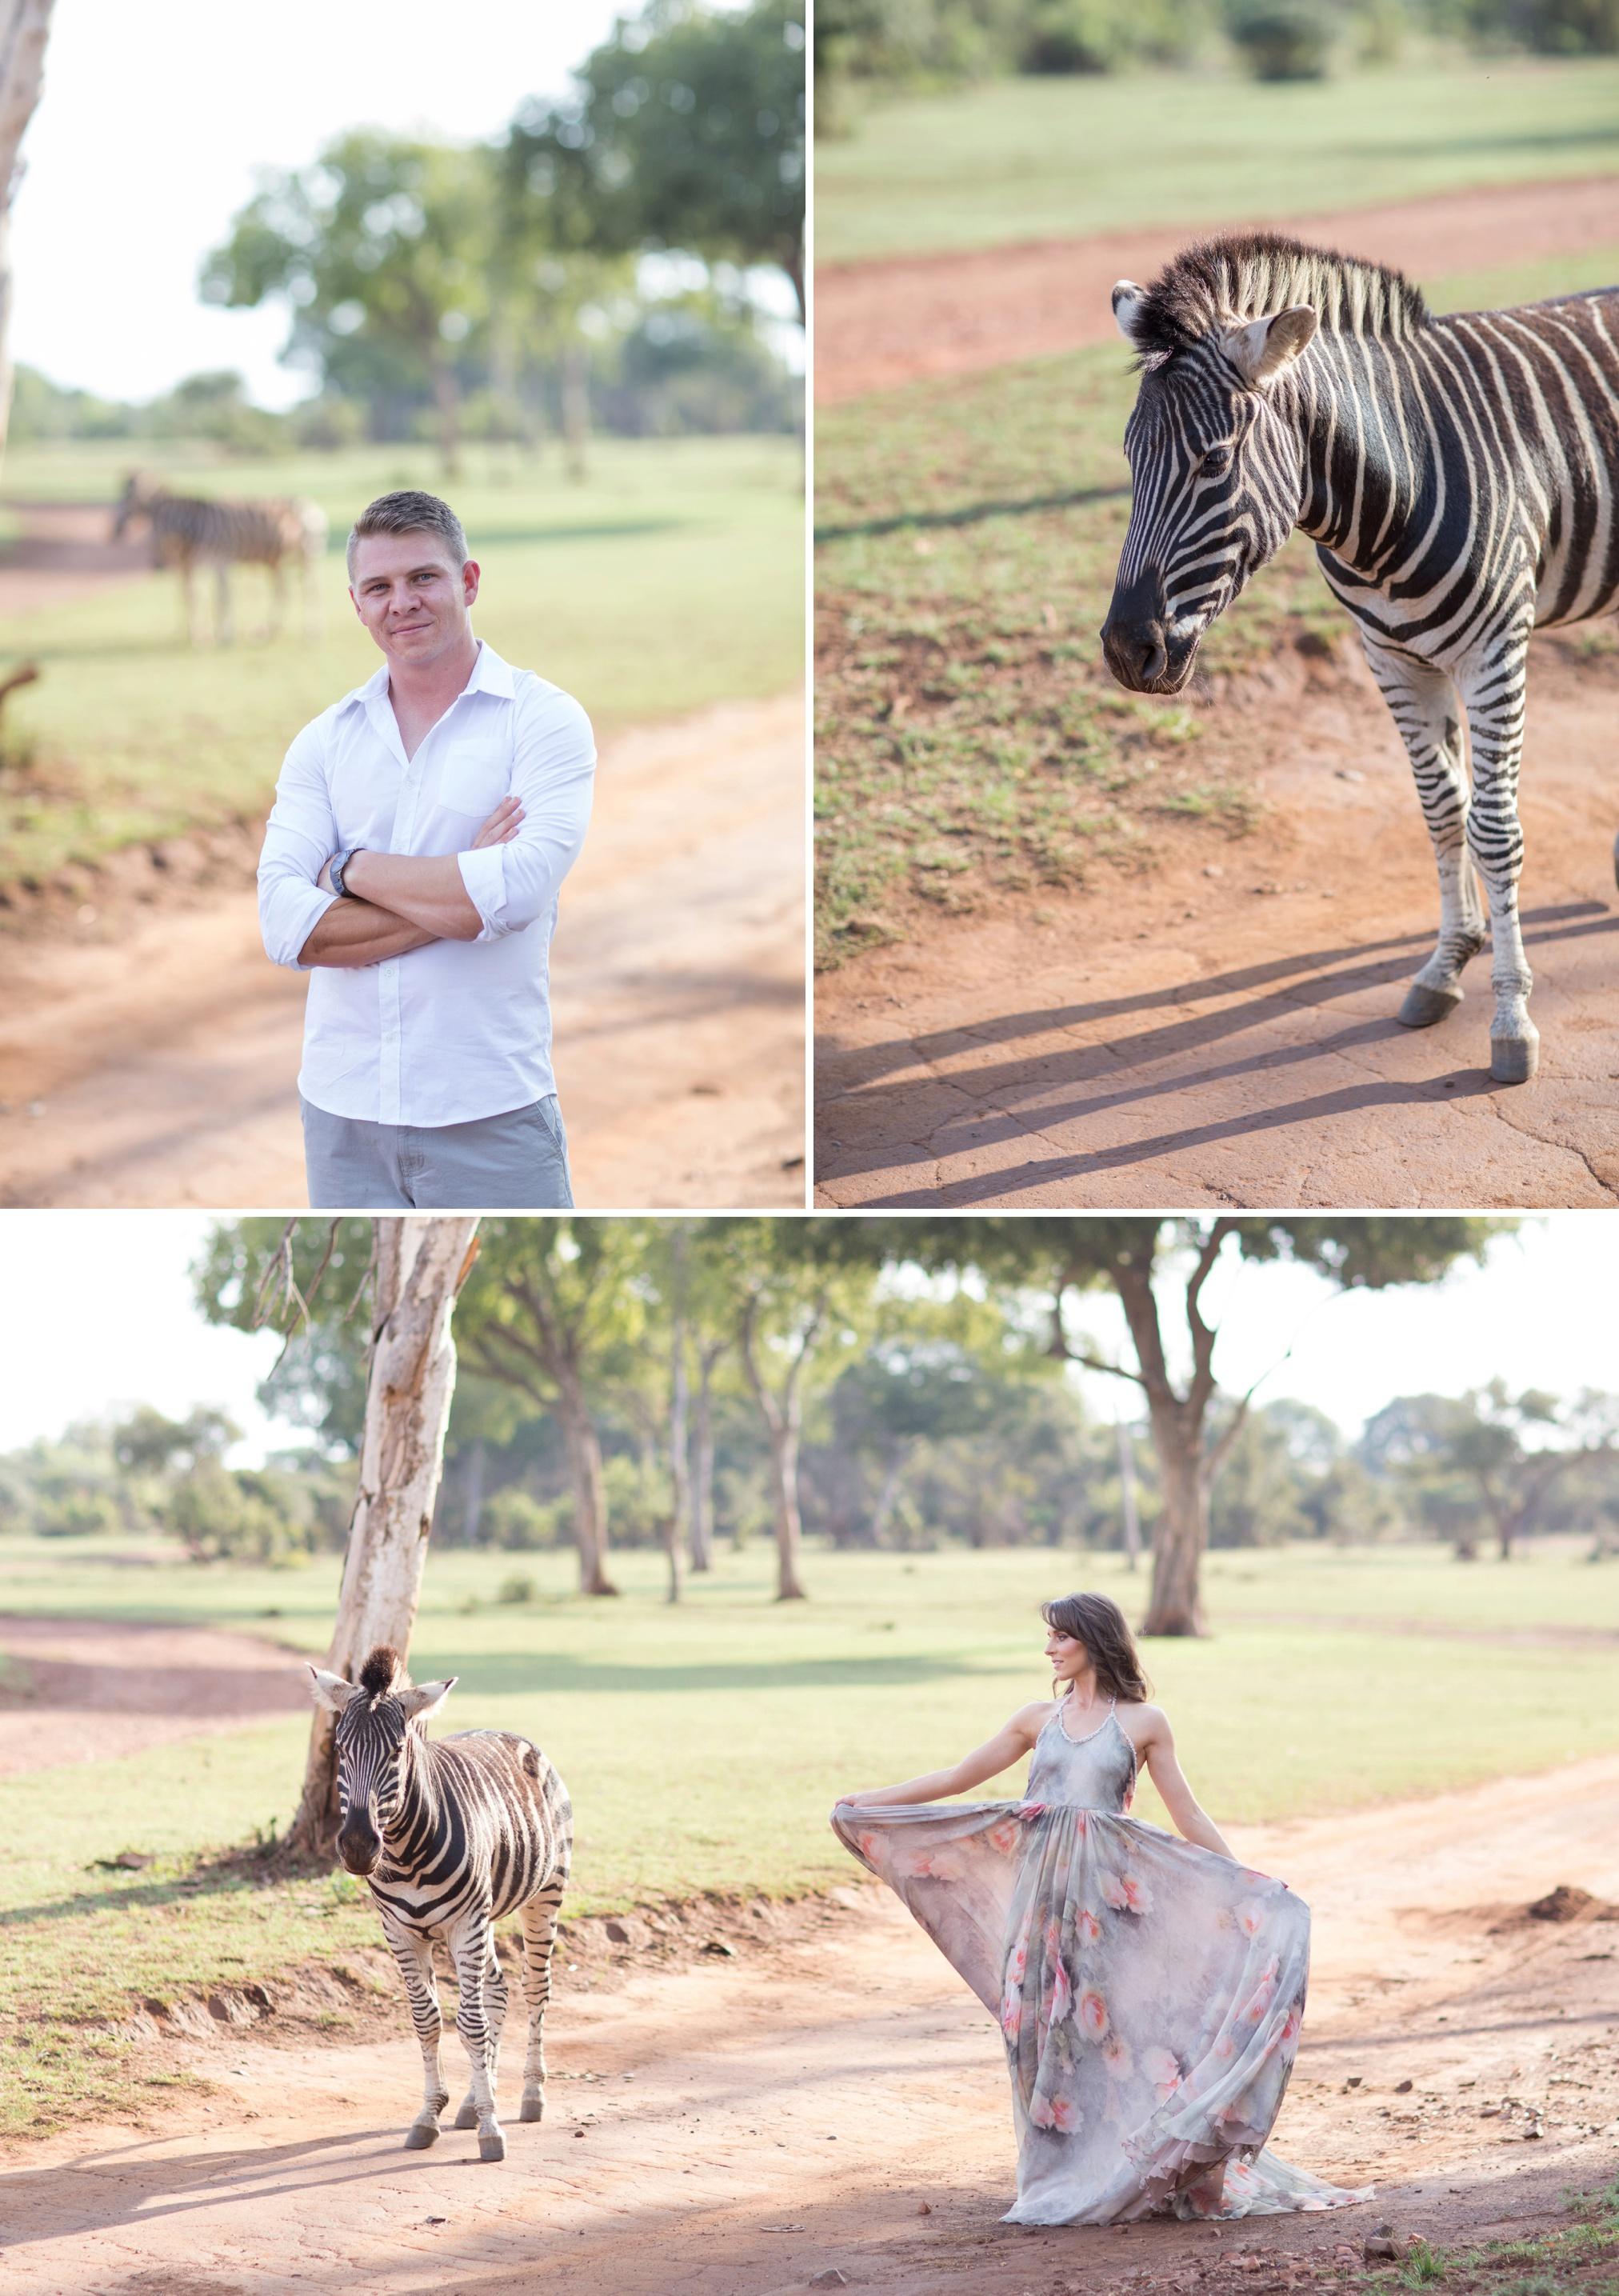 Glen_Afric_Kyle_and_Lindsay_engagement_elephants_safari_21